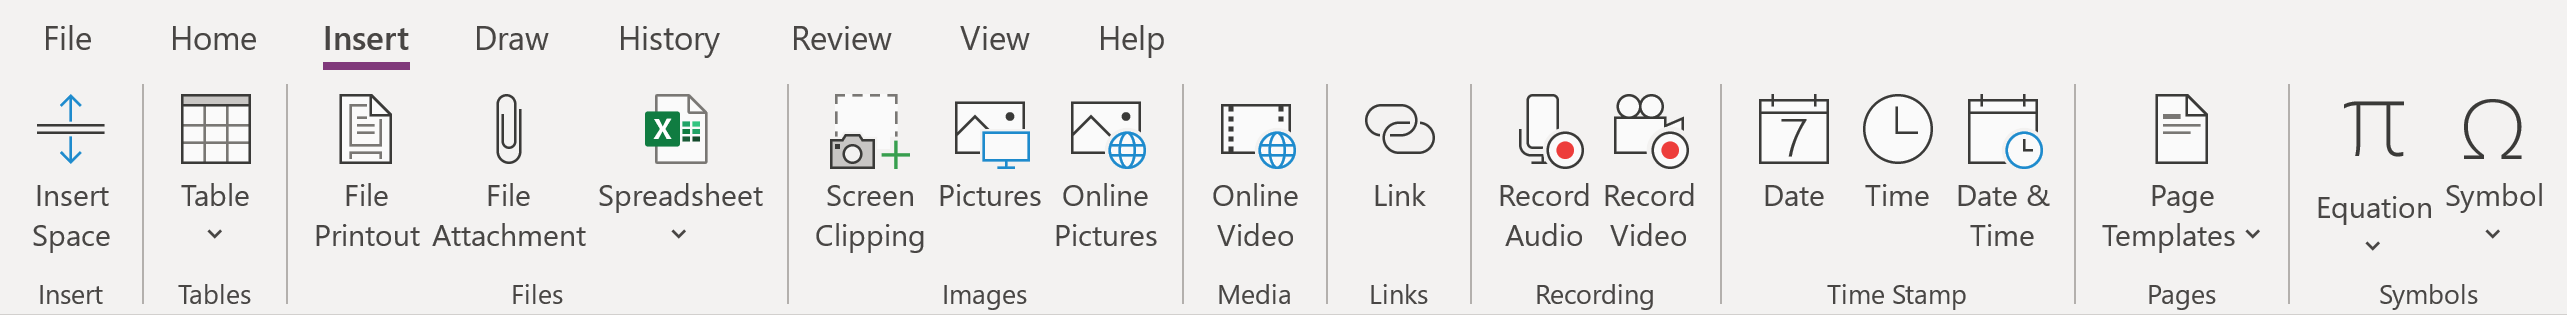 image of OneNote Insert tab, icrosoft OneNote Tips; Insert options